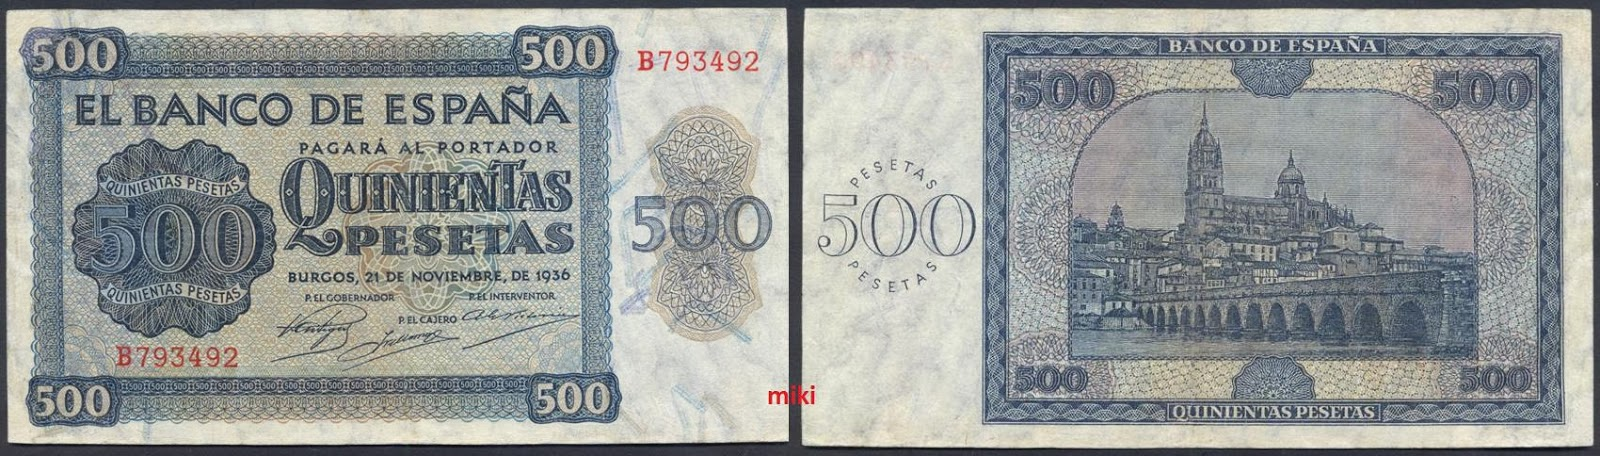 500 Pesetas 1936 500+36